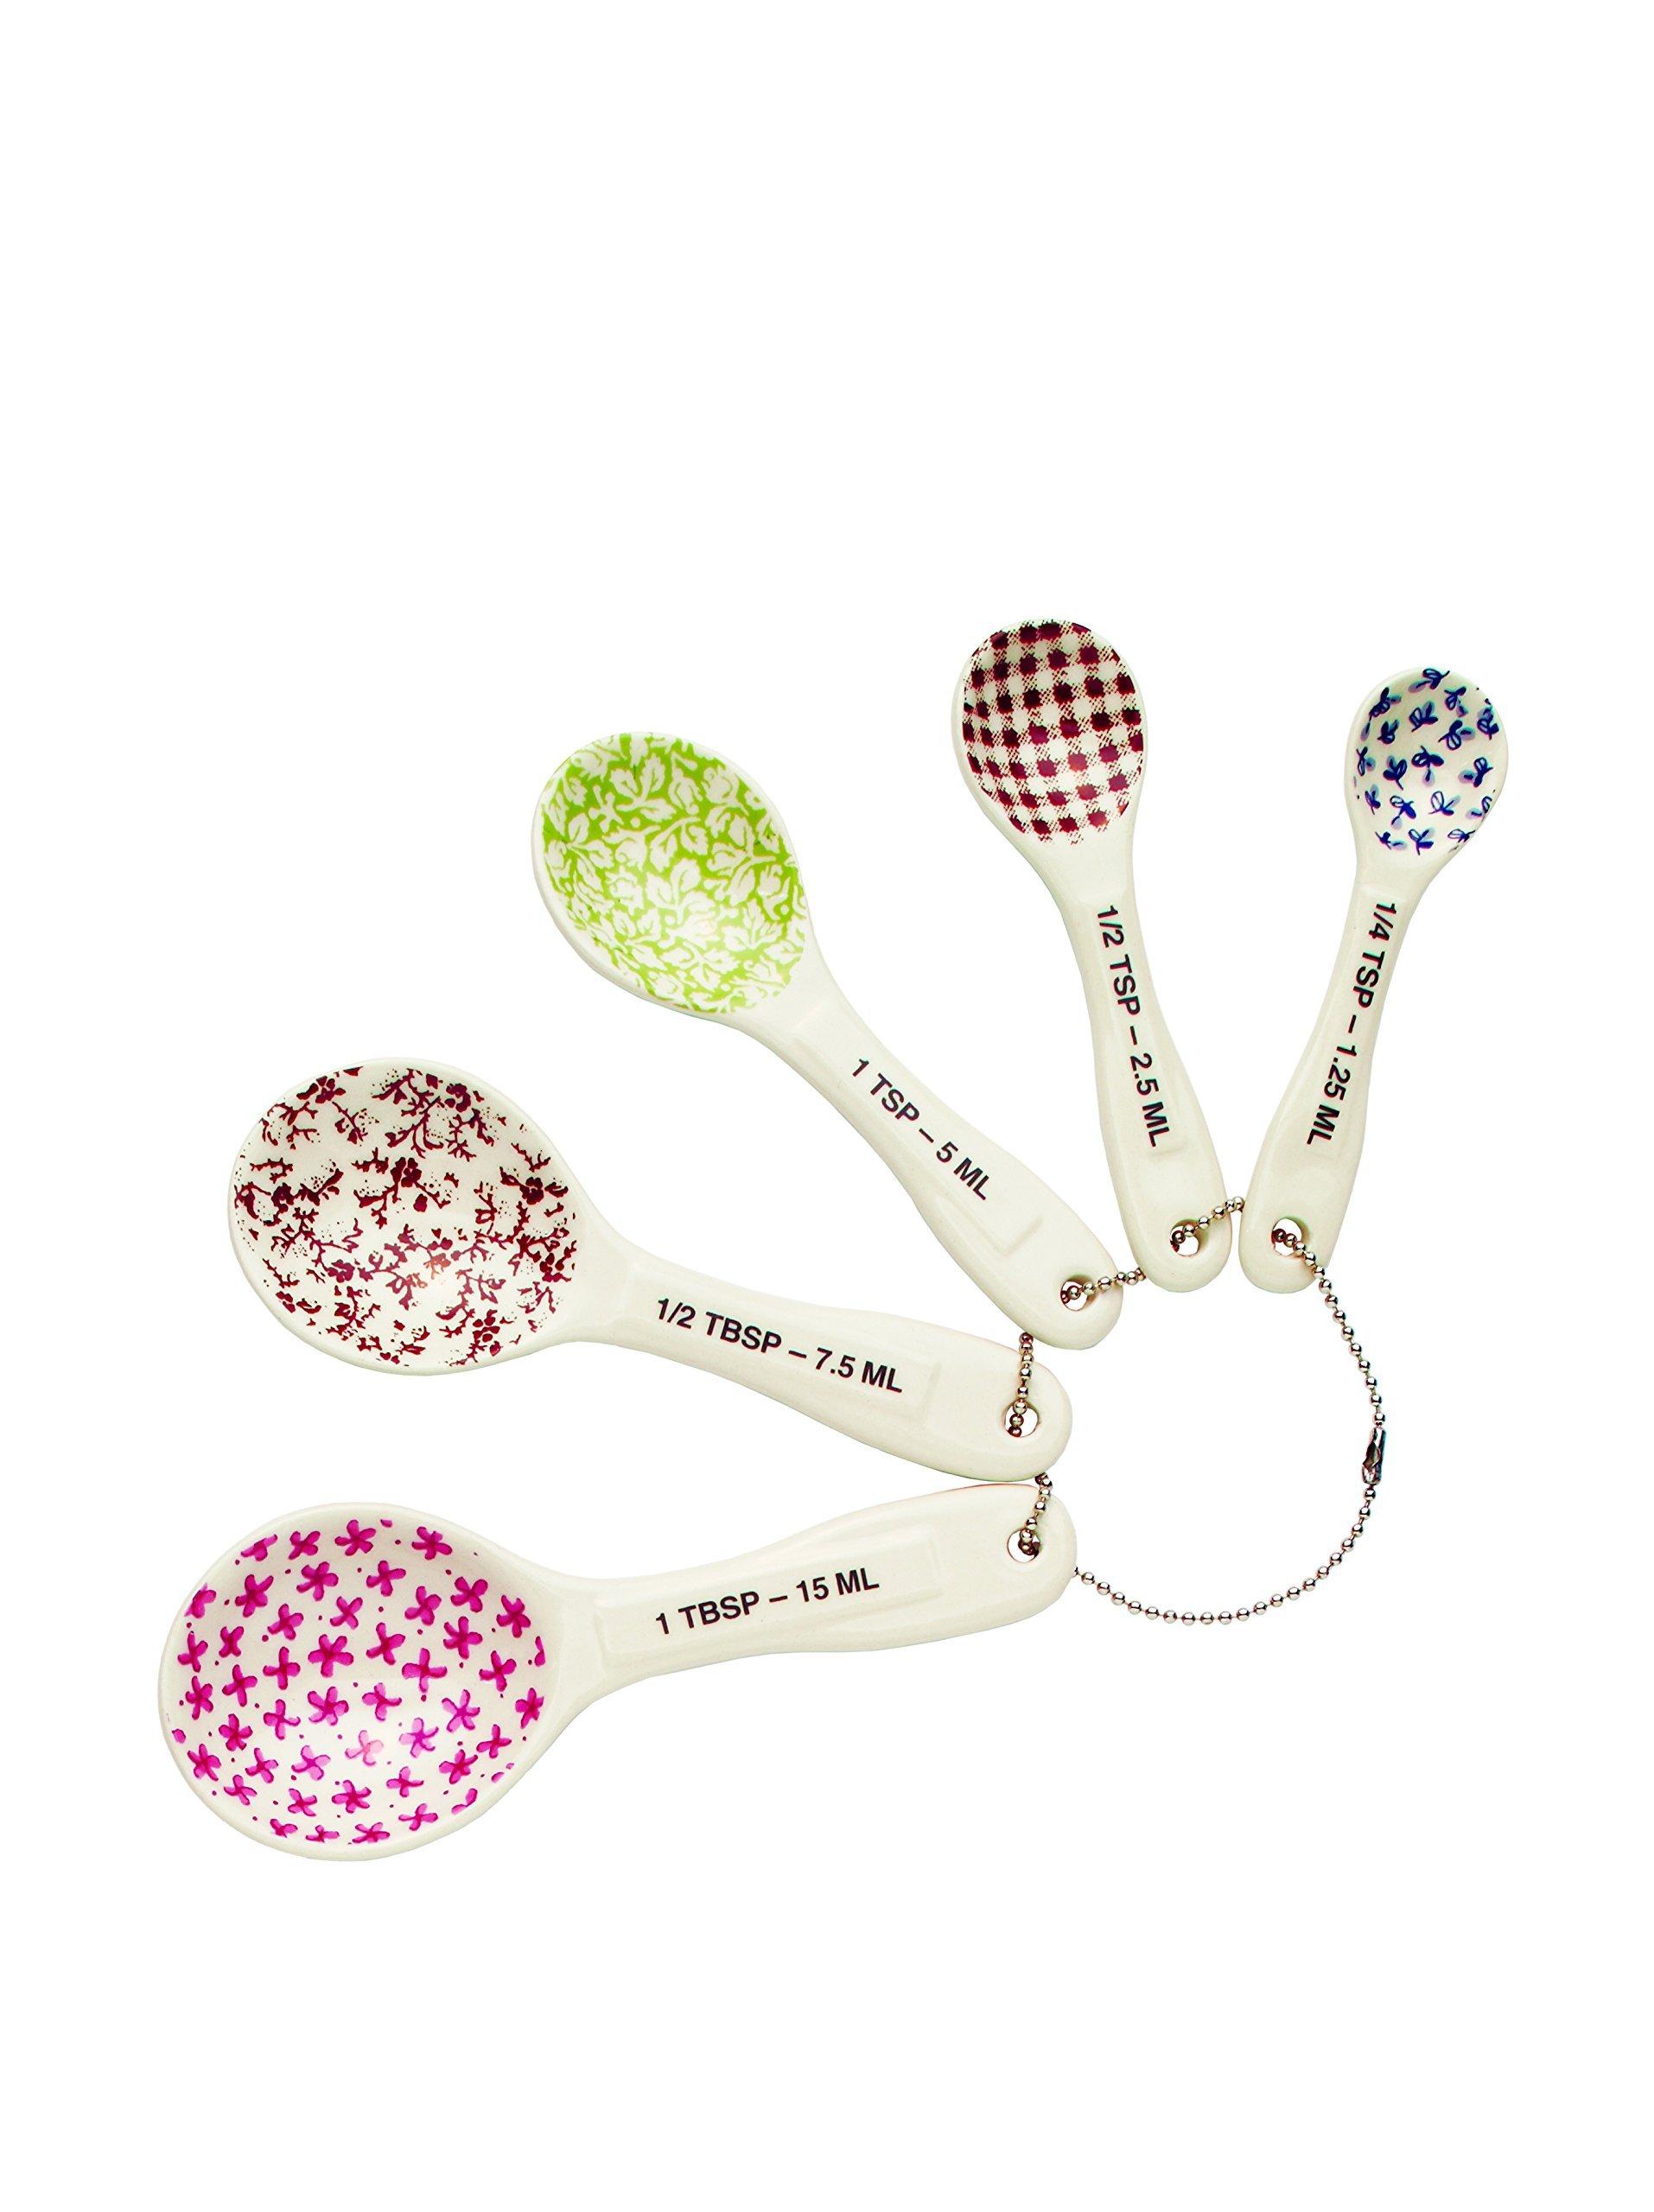 Rae Dunn Magenta 5 Piece Stoneware Measuring Spoon Set by Magenta